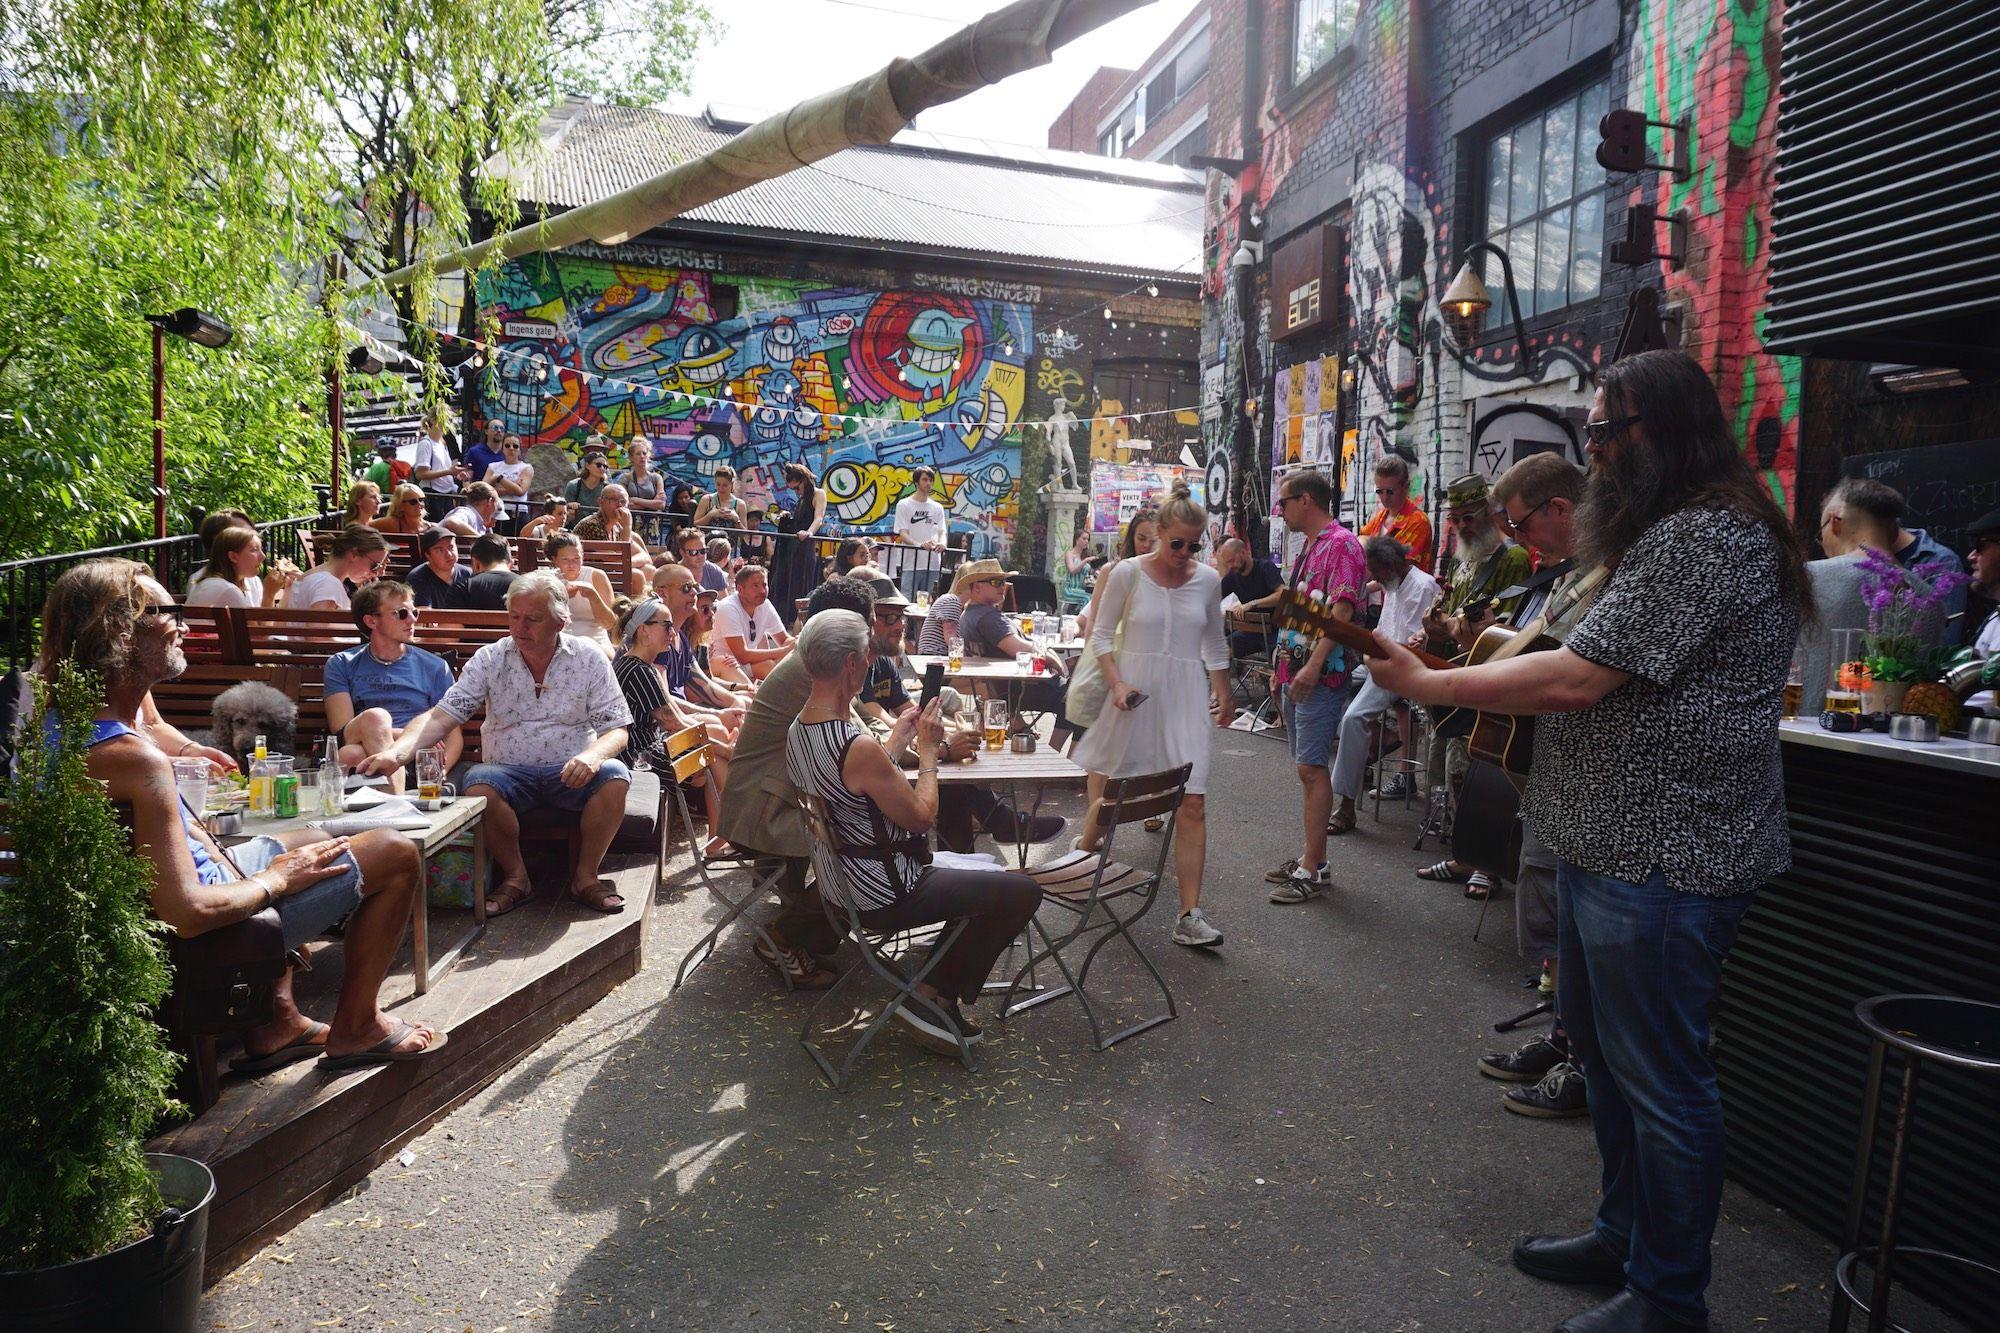 Free Jazz and Sunday Market at Oslo's Blå | Oslo, Free jazz, Night ...